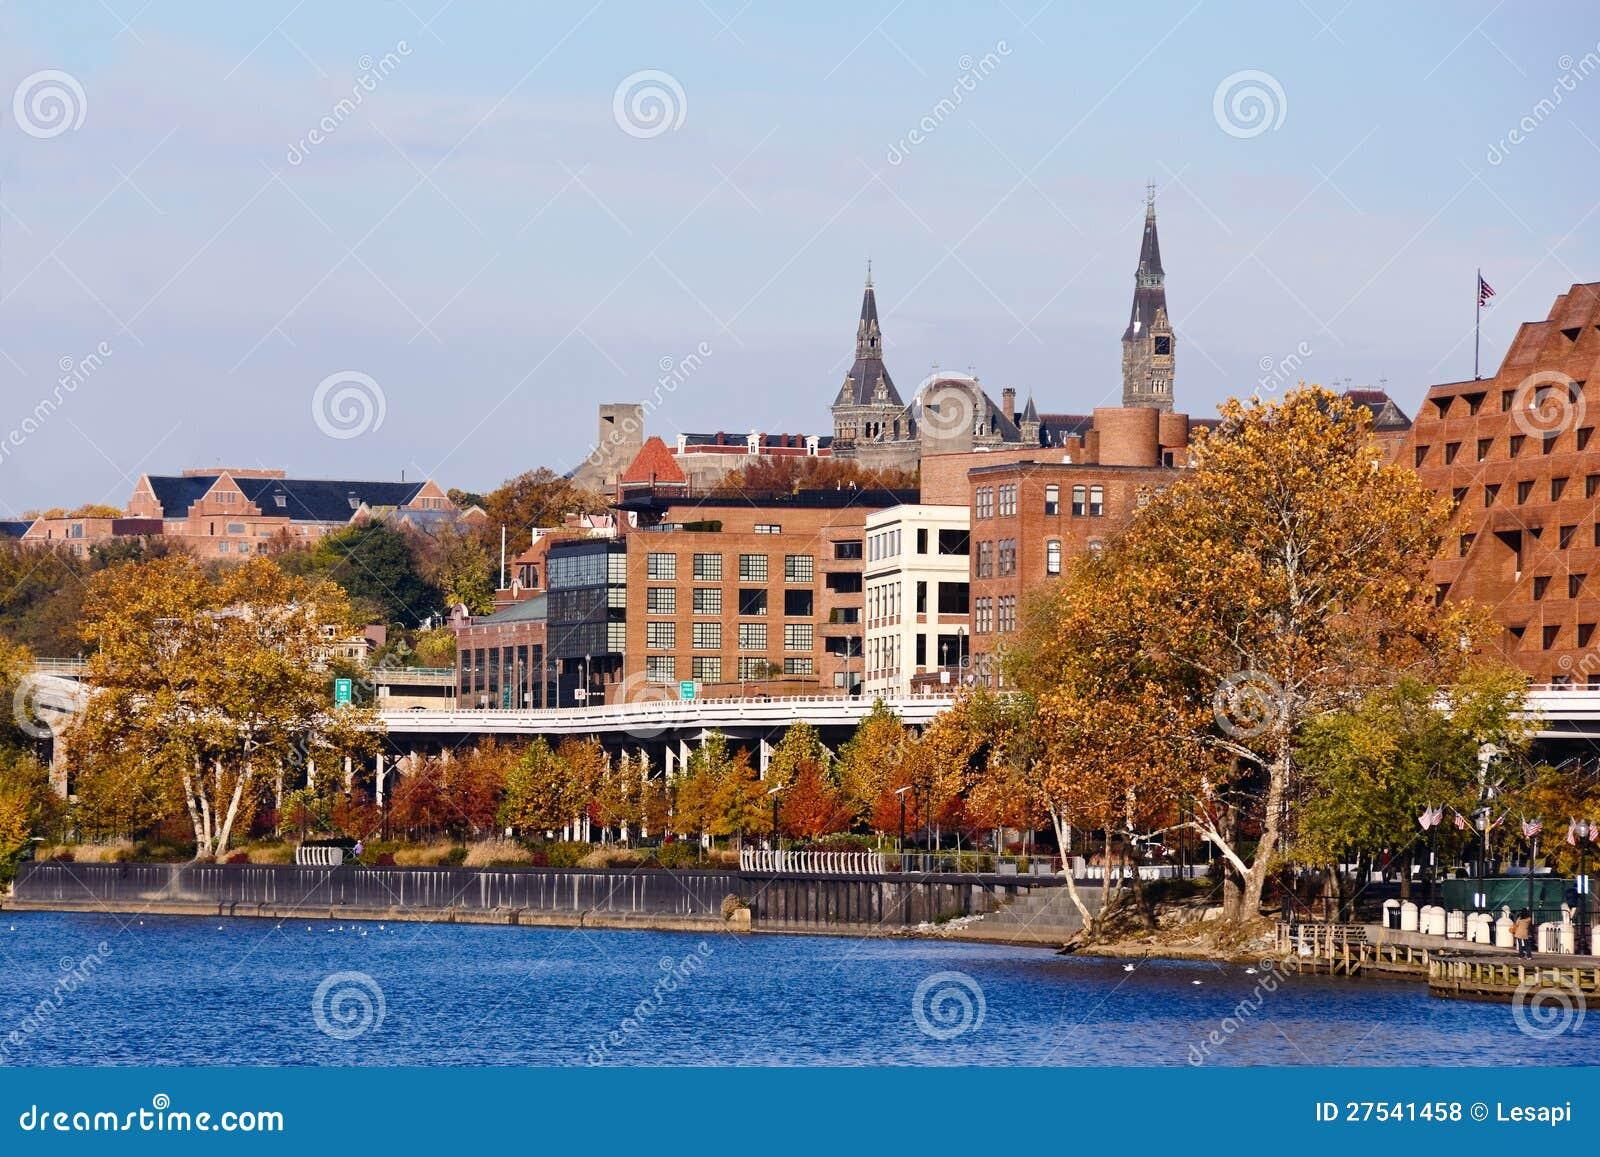 Georgetown Waterfront Park, Washington DC. Royalty Free Stock Photos ...